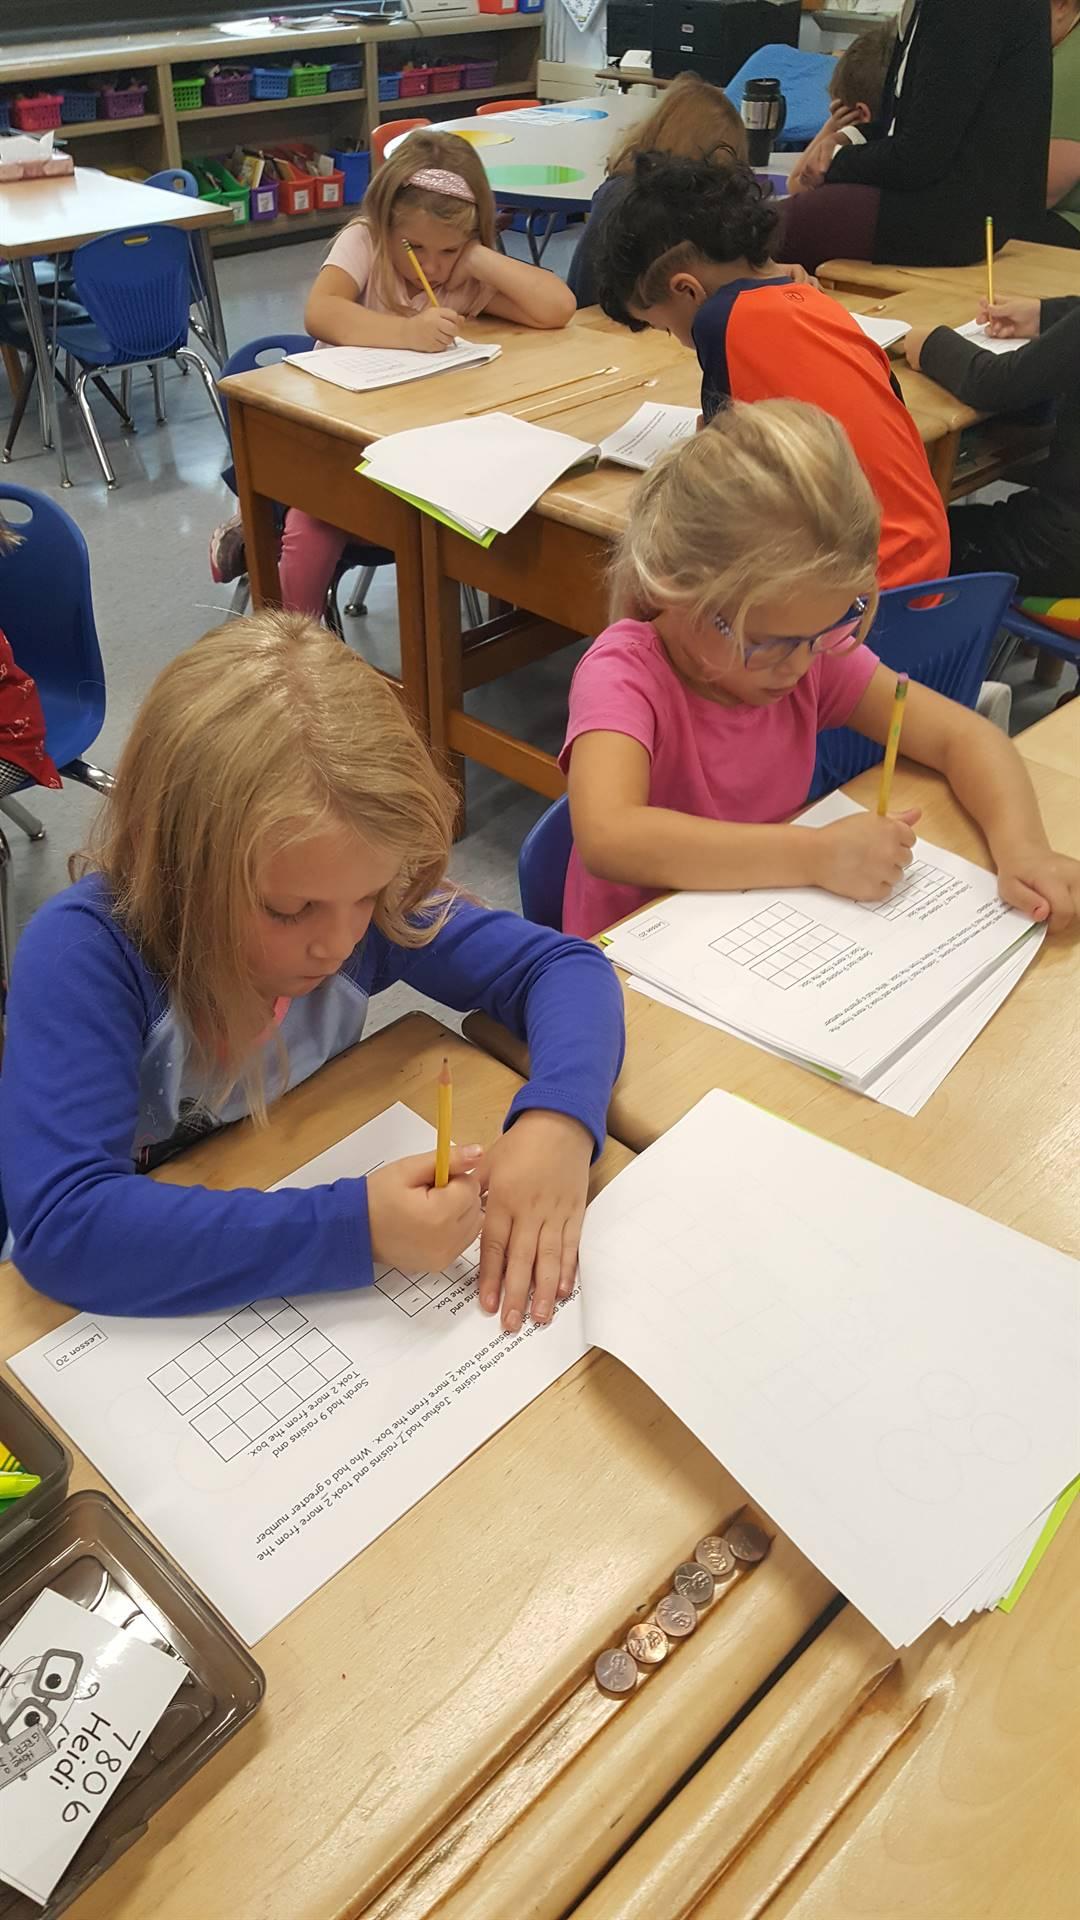 2 first graders hard at work!